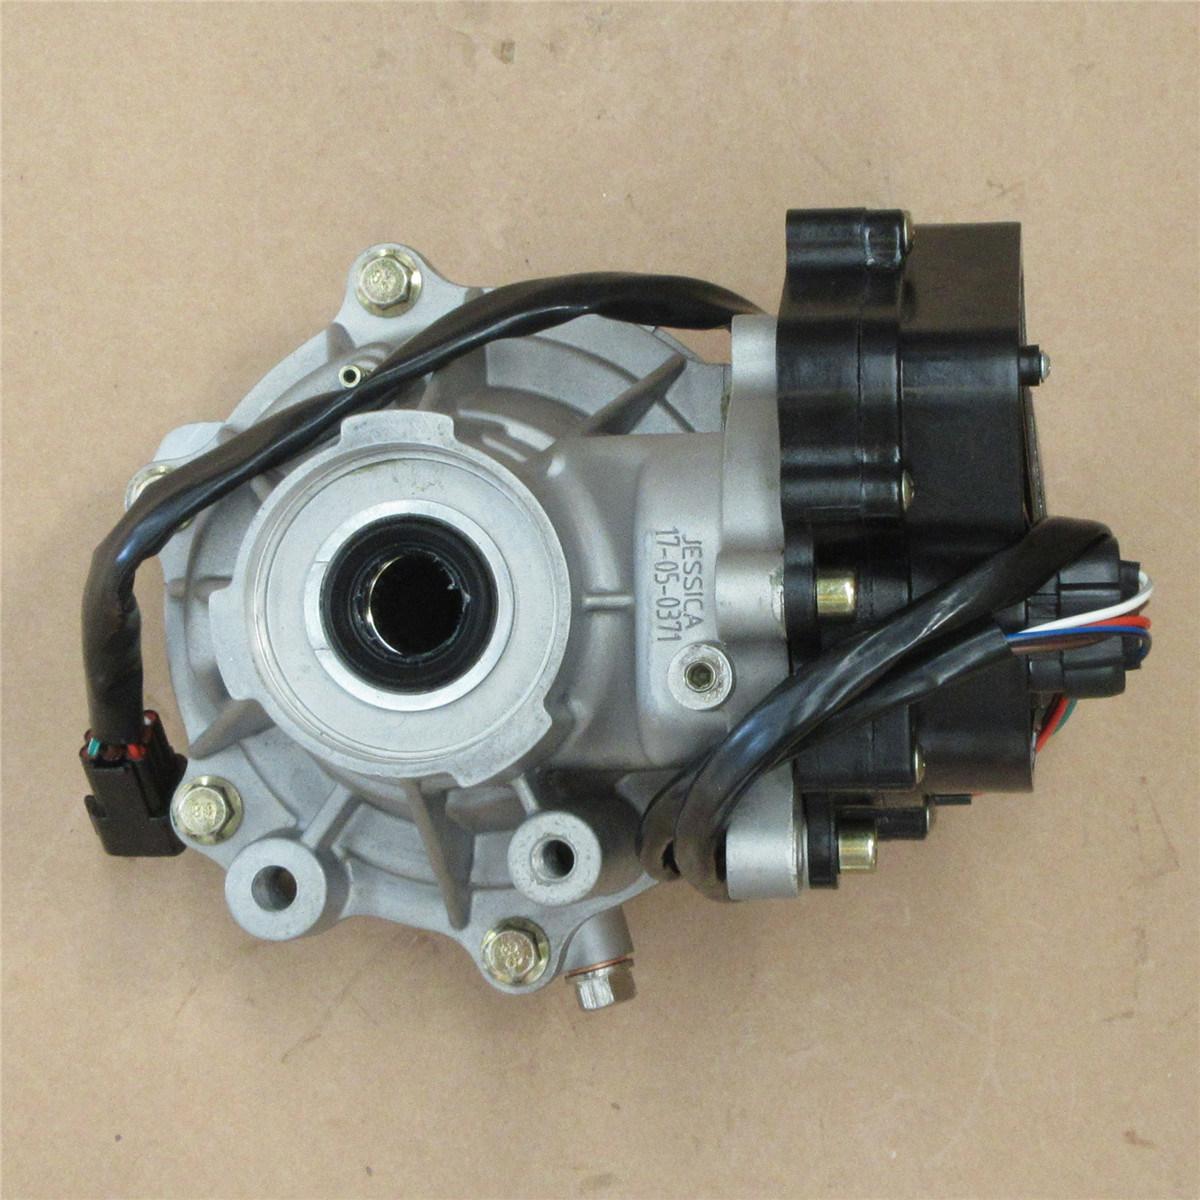 China Made ATV Parts 0180-330000 CF500/800 for Cfmoto Rear Axle - China  Rear Axle, All-Terrain Vehicle Parts